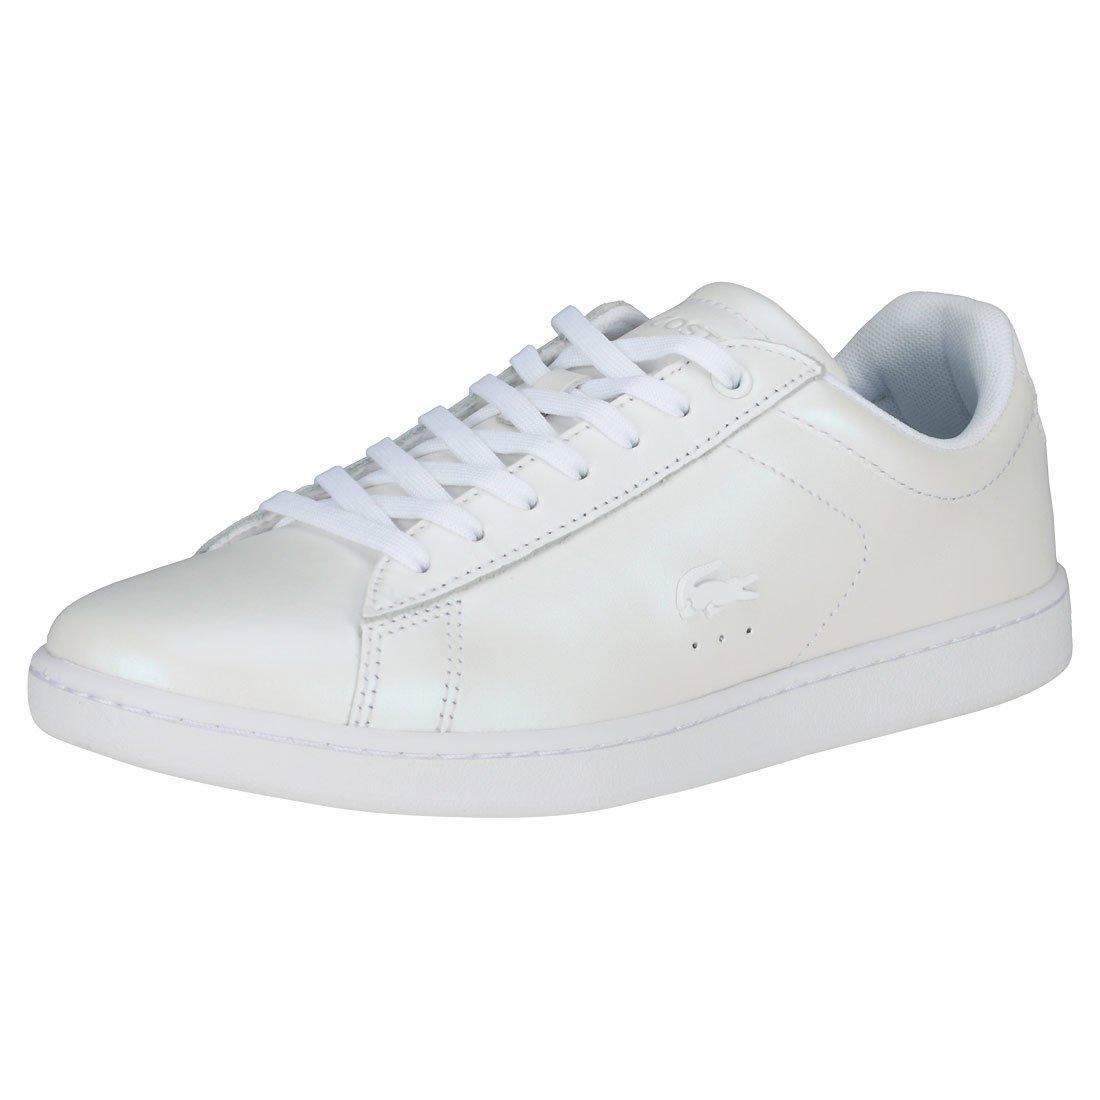 Lacoste Mujer Blanco Carnaby EVO 318 5 Zapatillas-UK 4